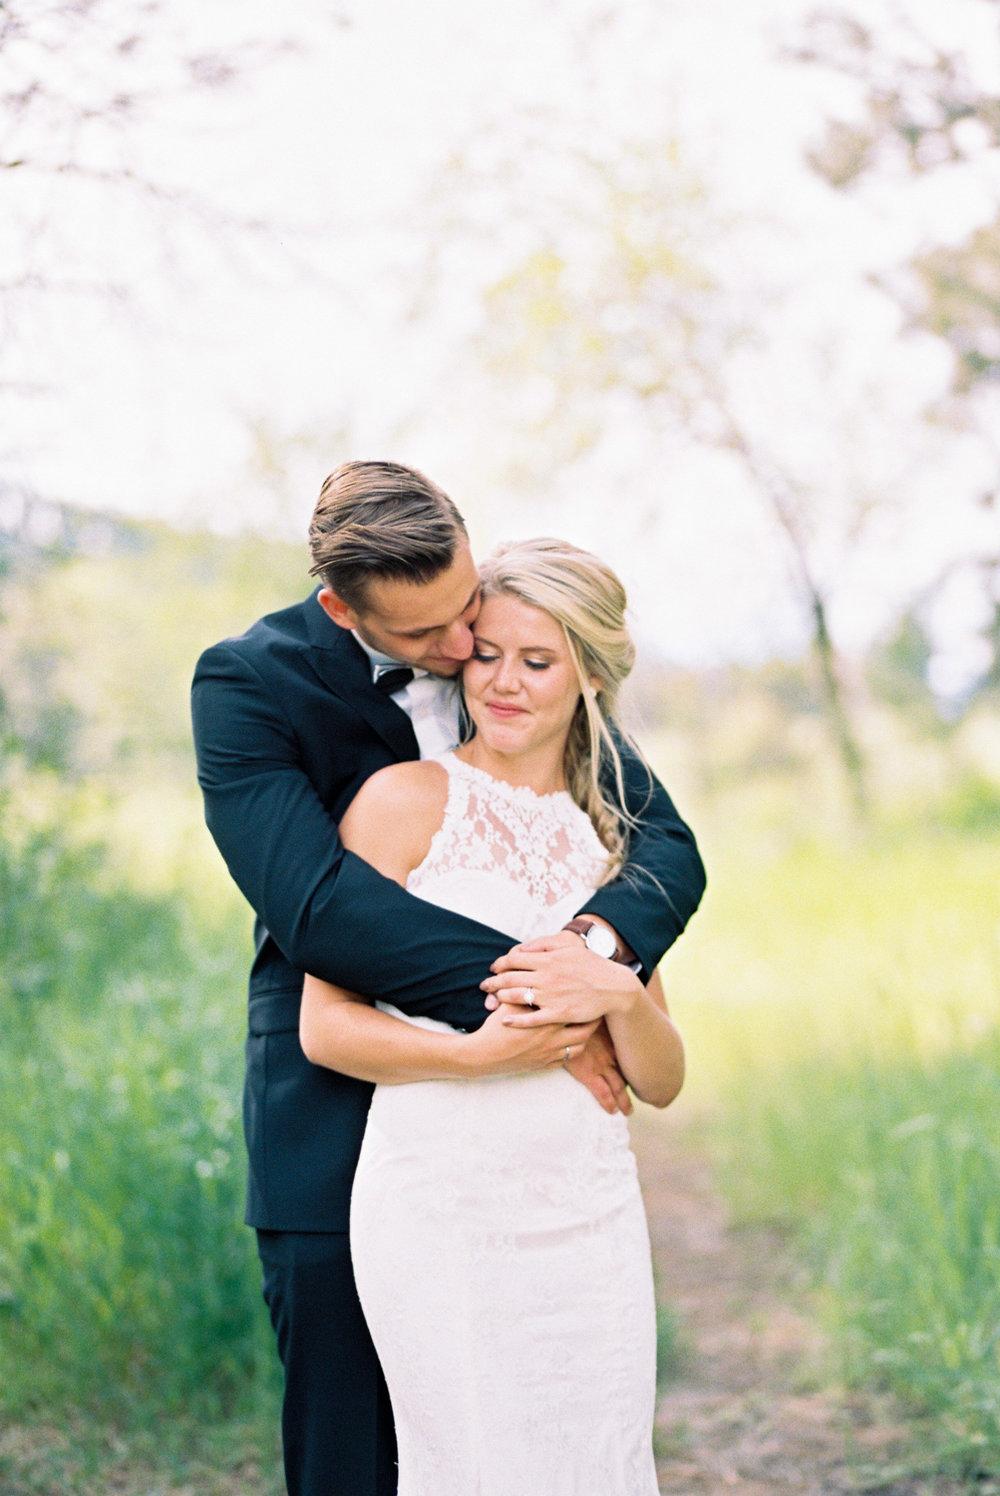 ivyandrosephoto-kelowna-wedding-160.jpg